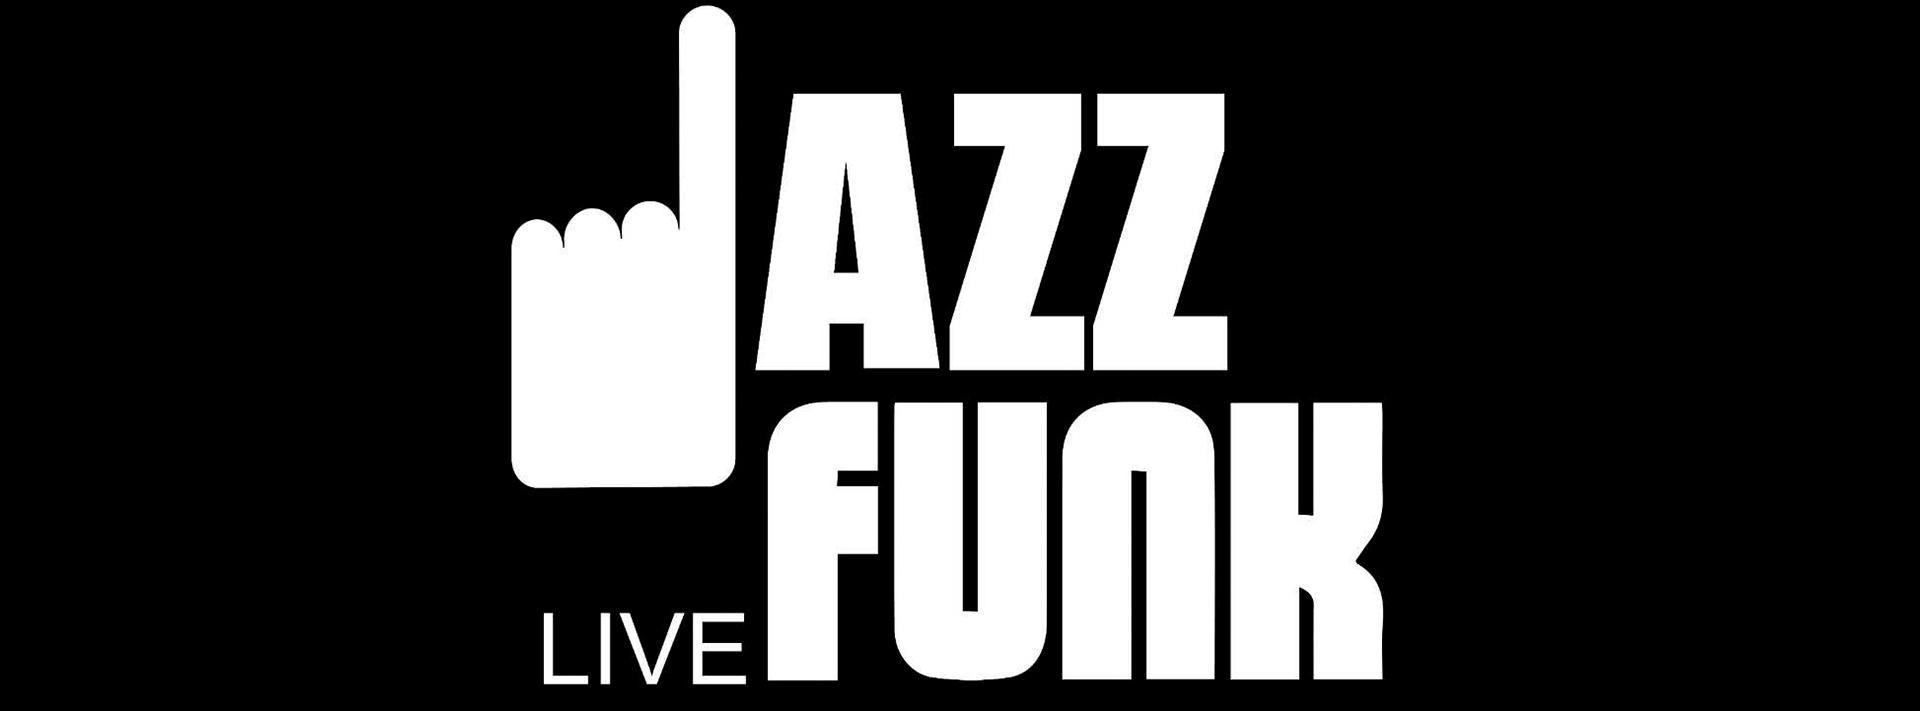 Jazz Funk Music Live Session 2020